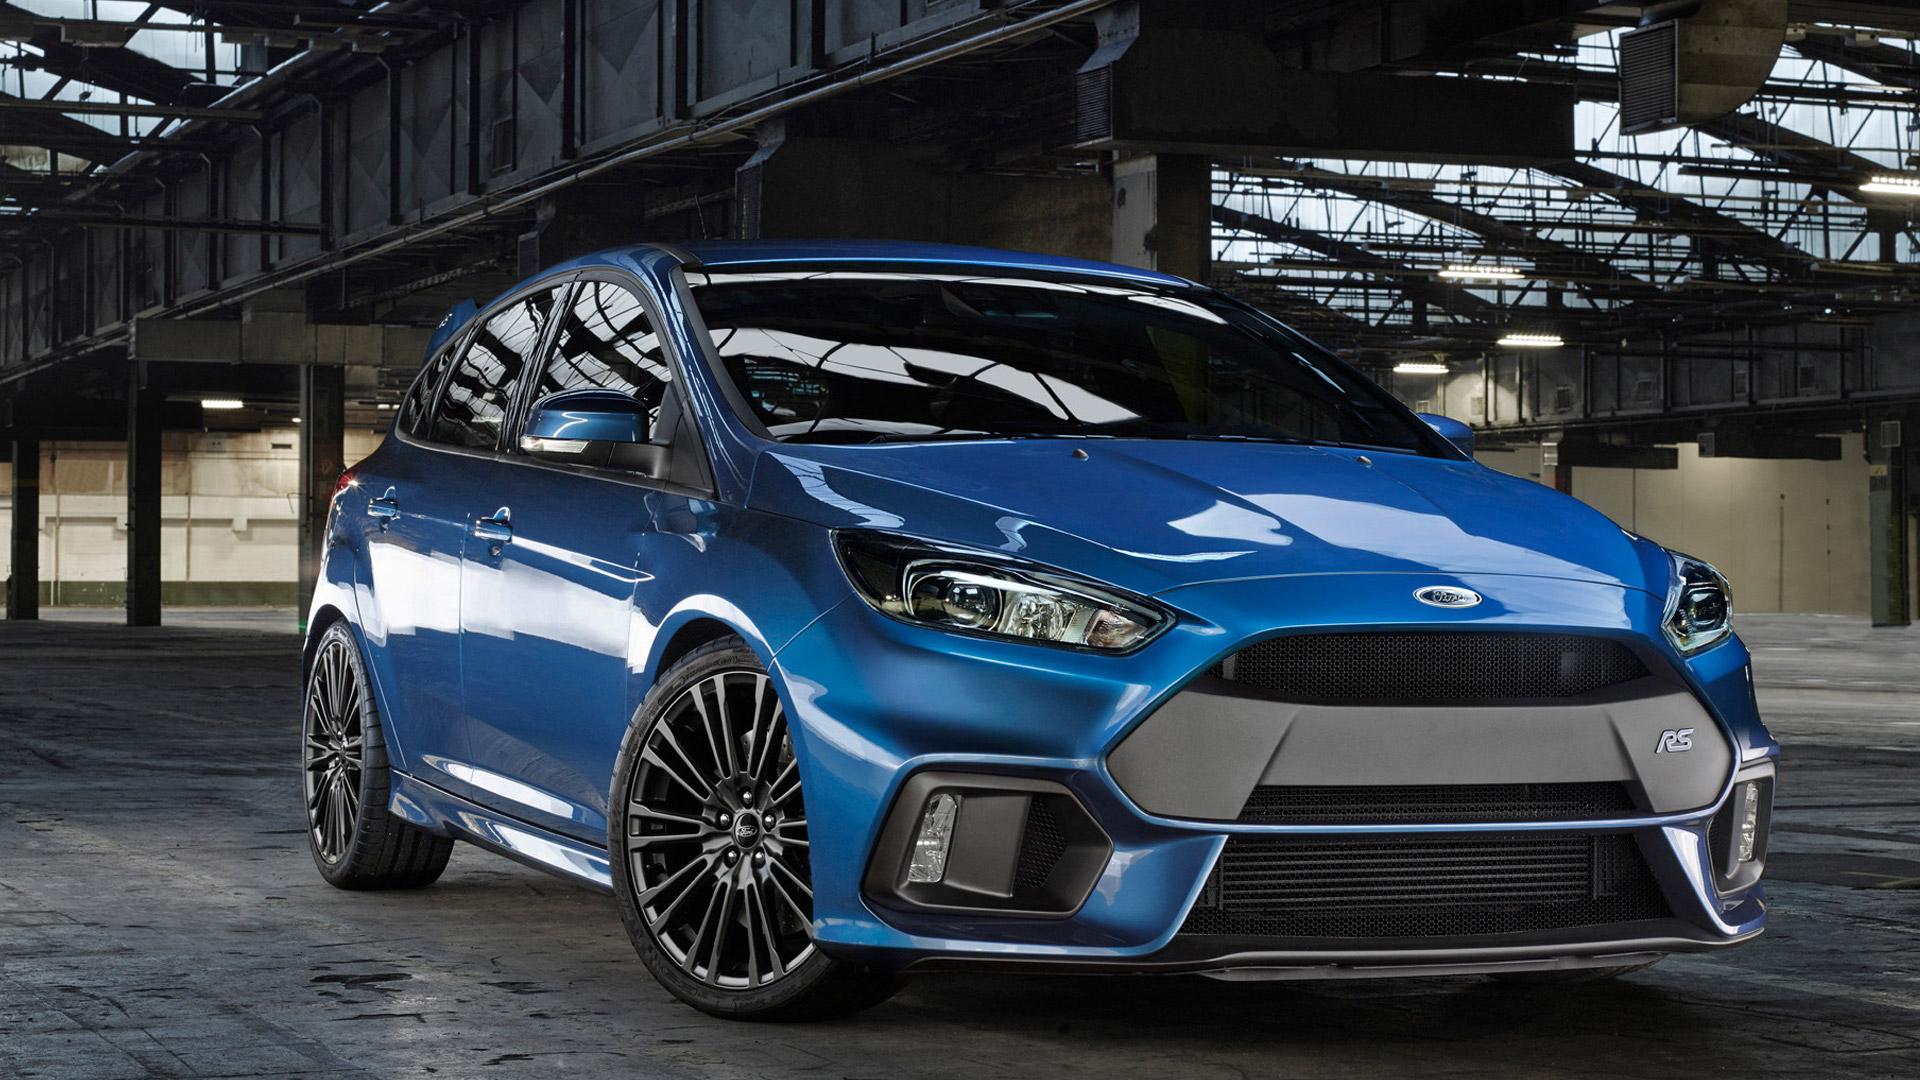 Ford Focus St Specs 0 60 >> [42+] 2016 Ford Focus ST Wallpaper on WallpaperSafari